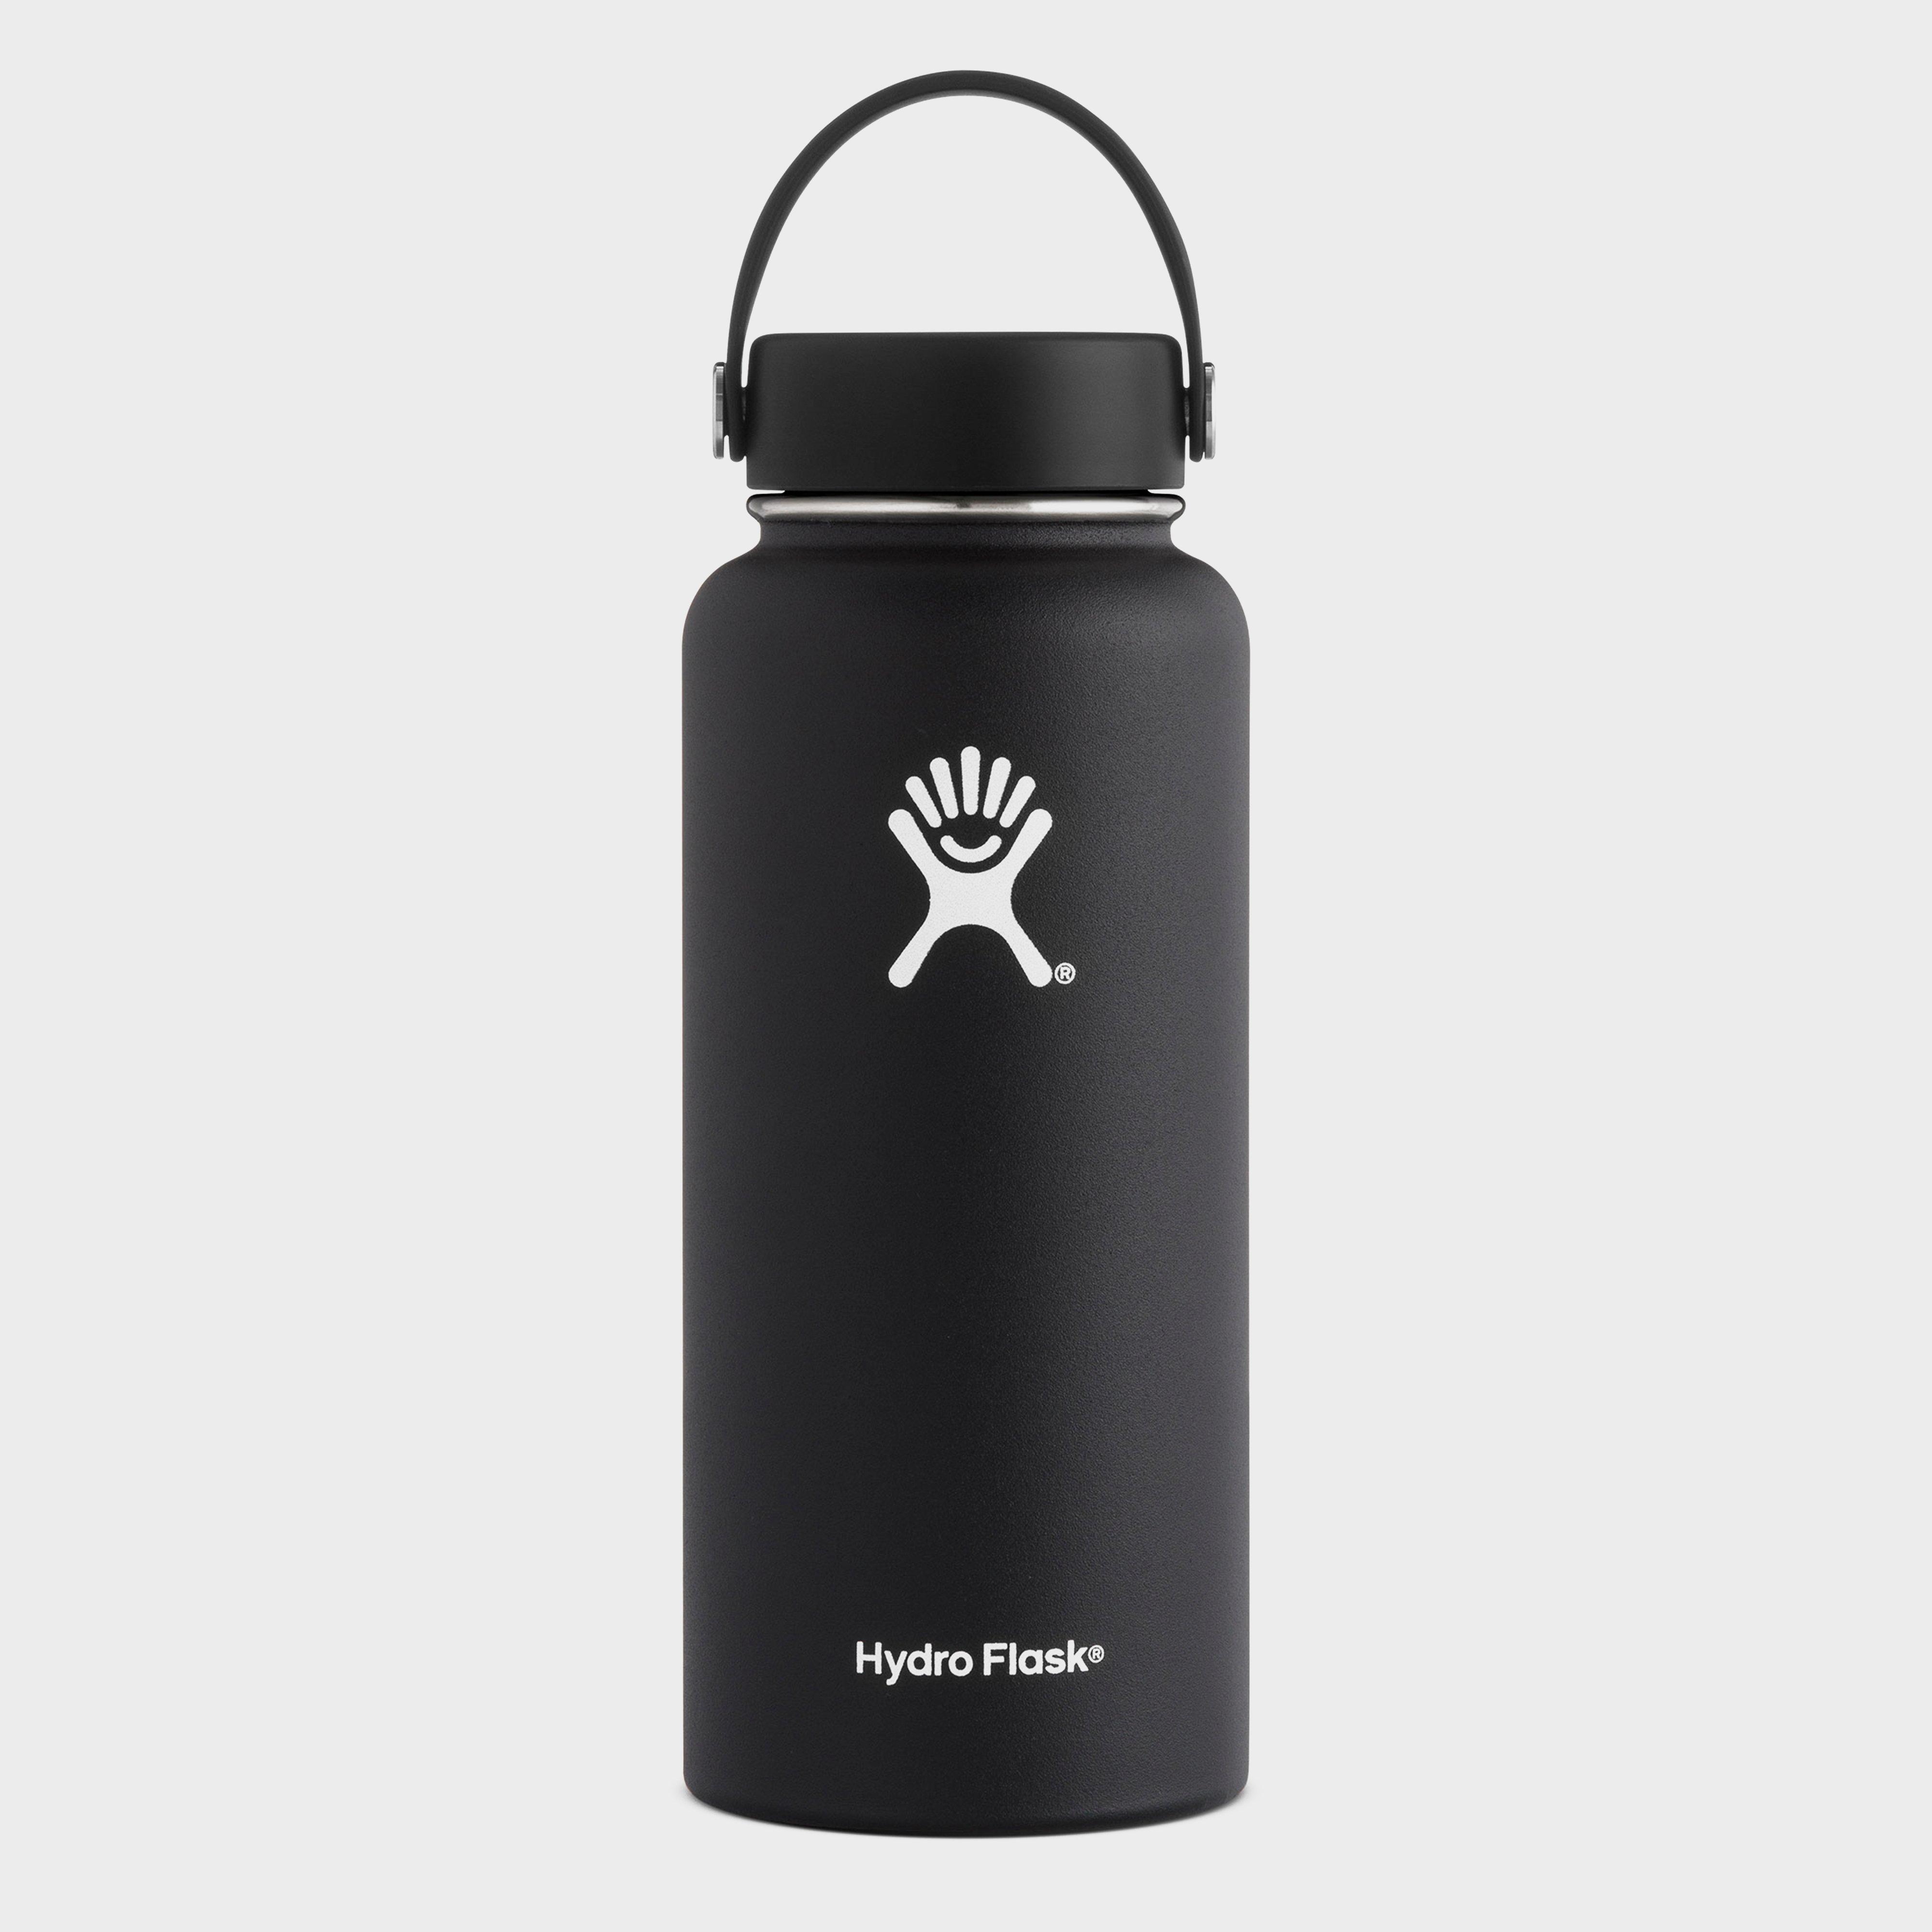 Hydro Flask 32oz Wide Mouth Flask, Black/BLACK